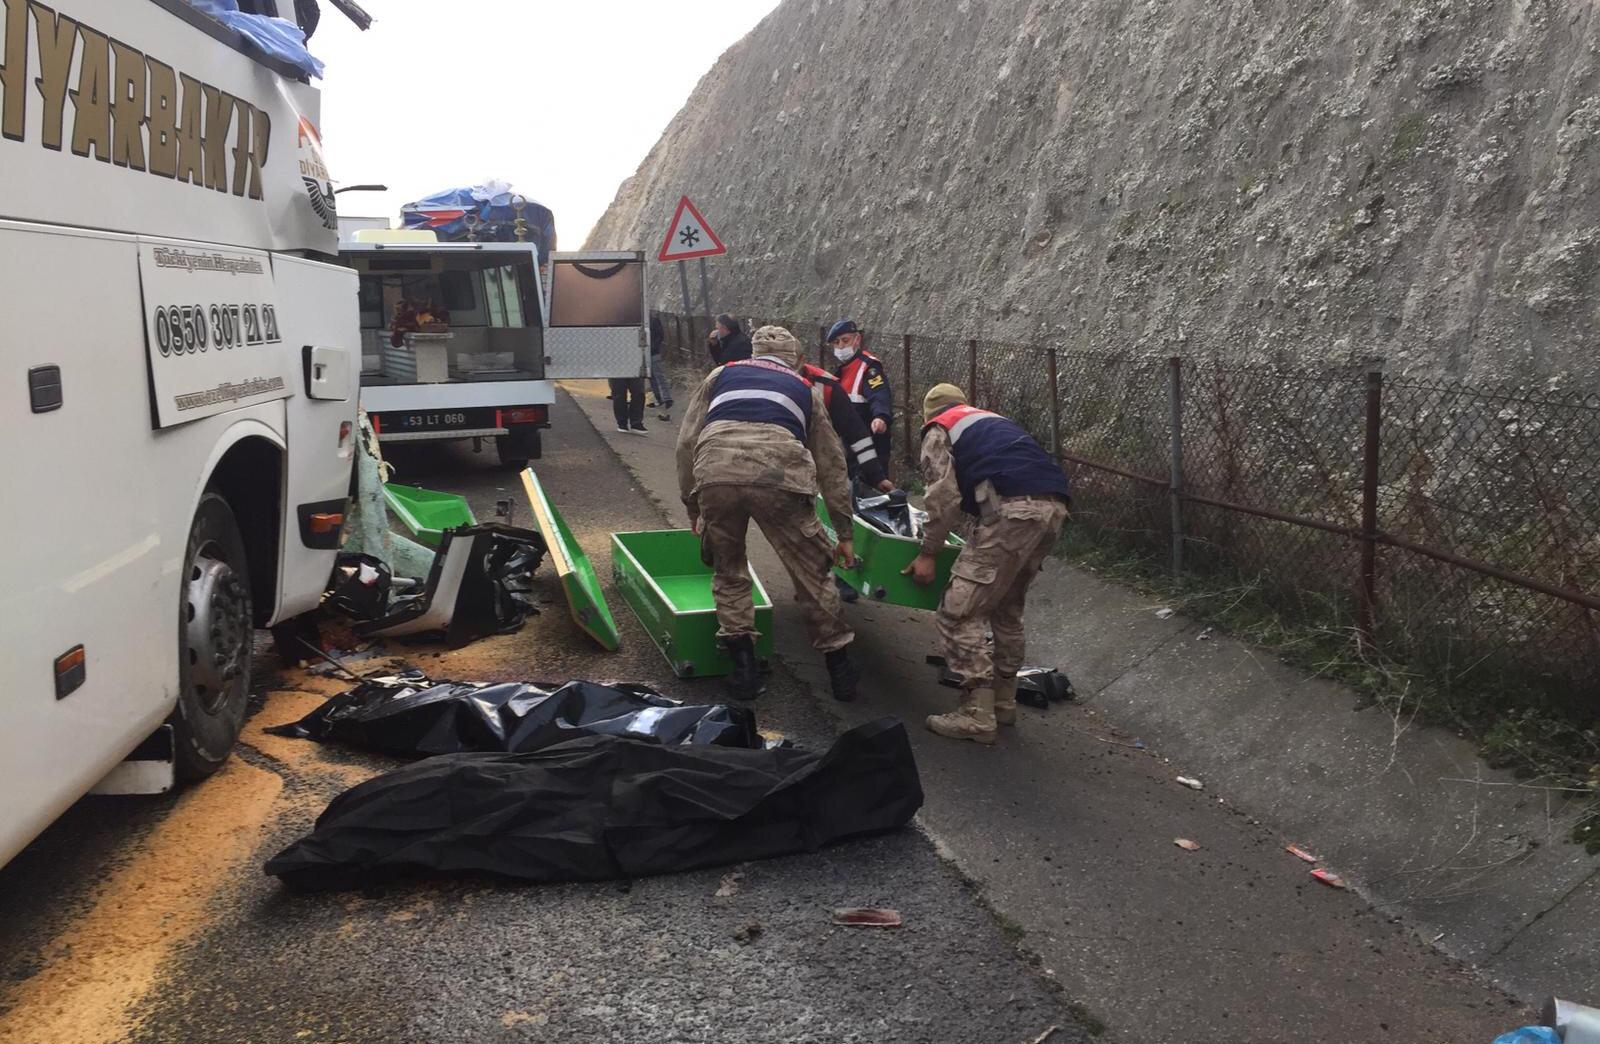 Kazada üç kişi yaşamını yitirdi.